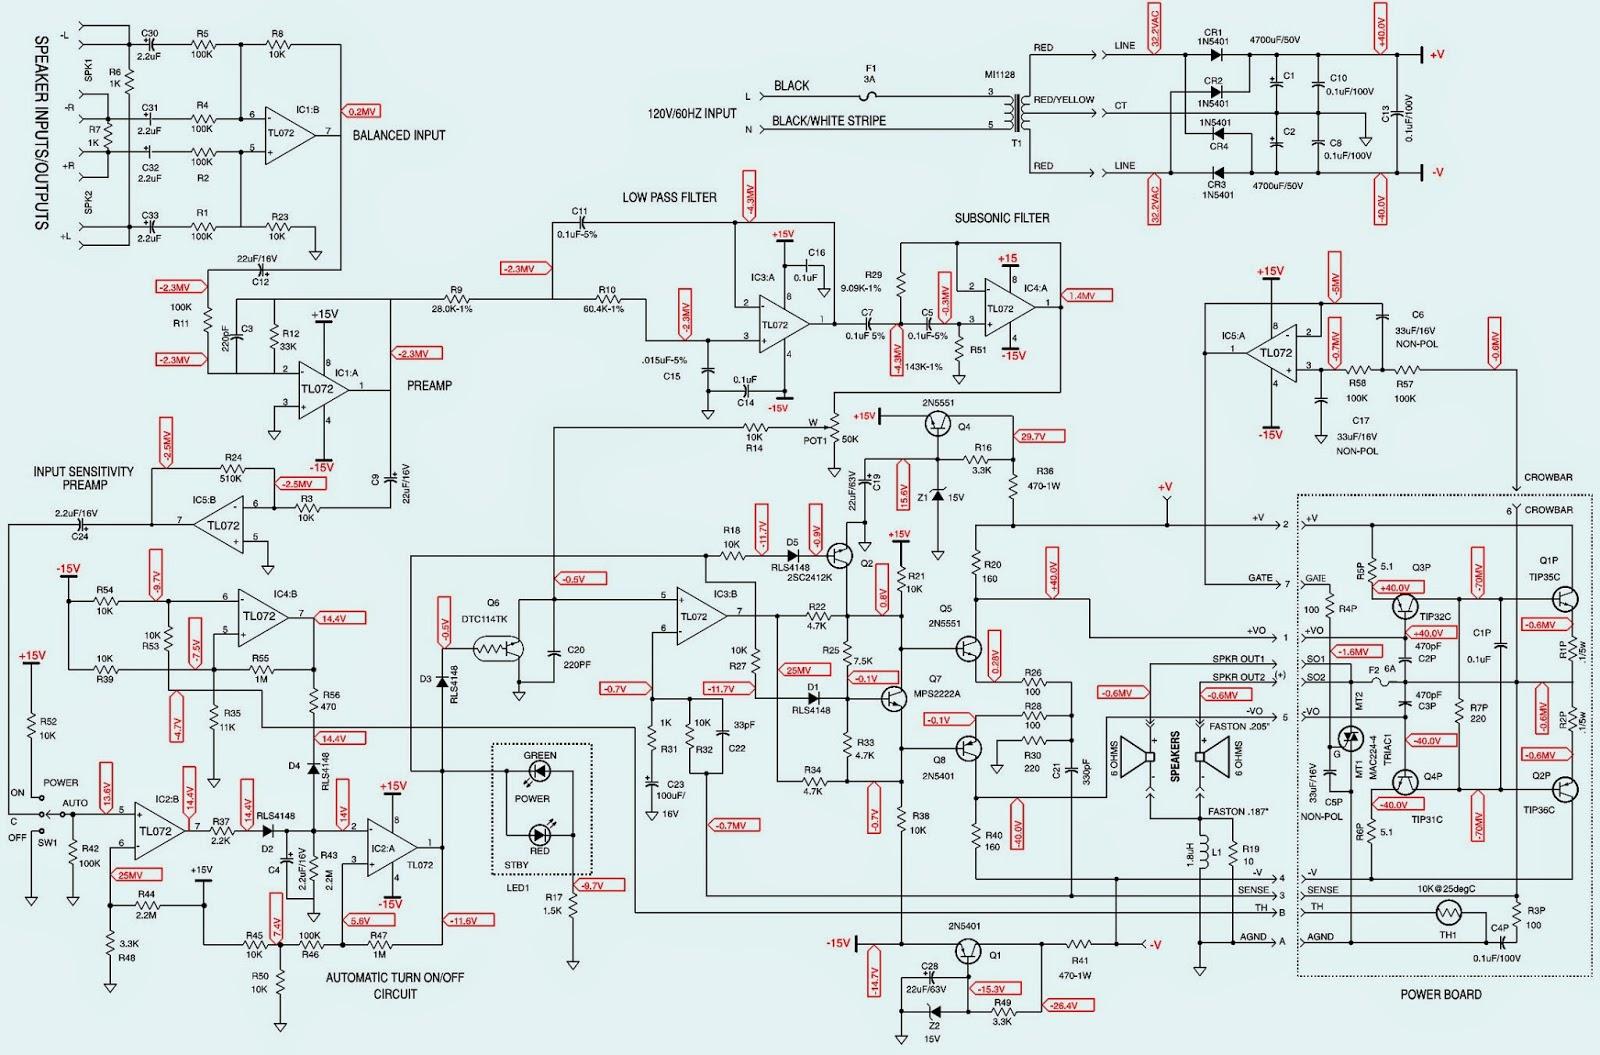 medium resolution of jbl powered subwoofer schematic diagram wiring diagram data val jbl bass15 jbl bass16 schematic diagram